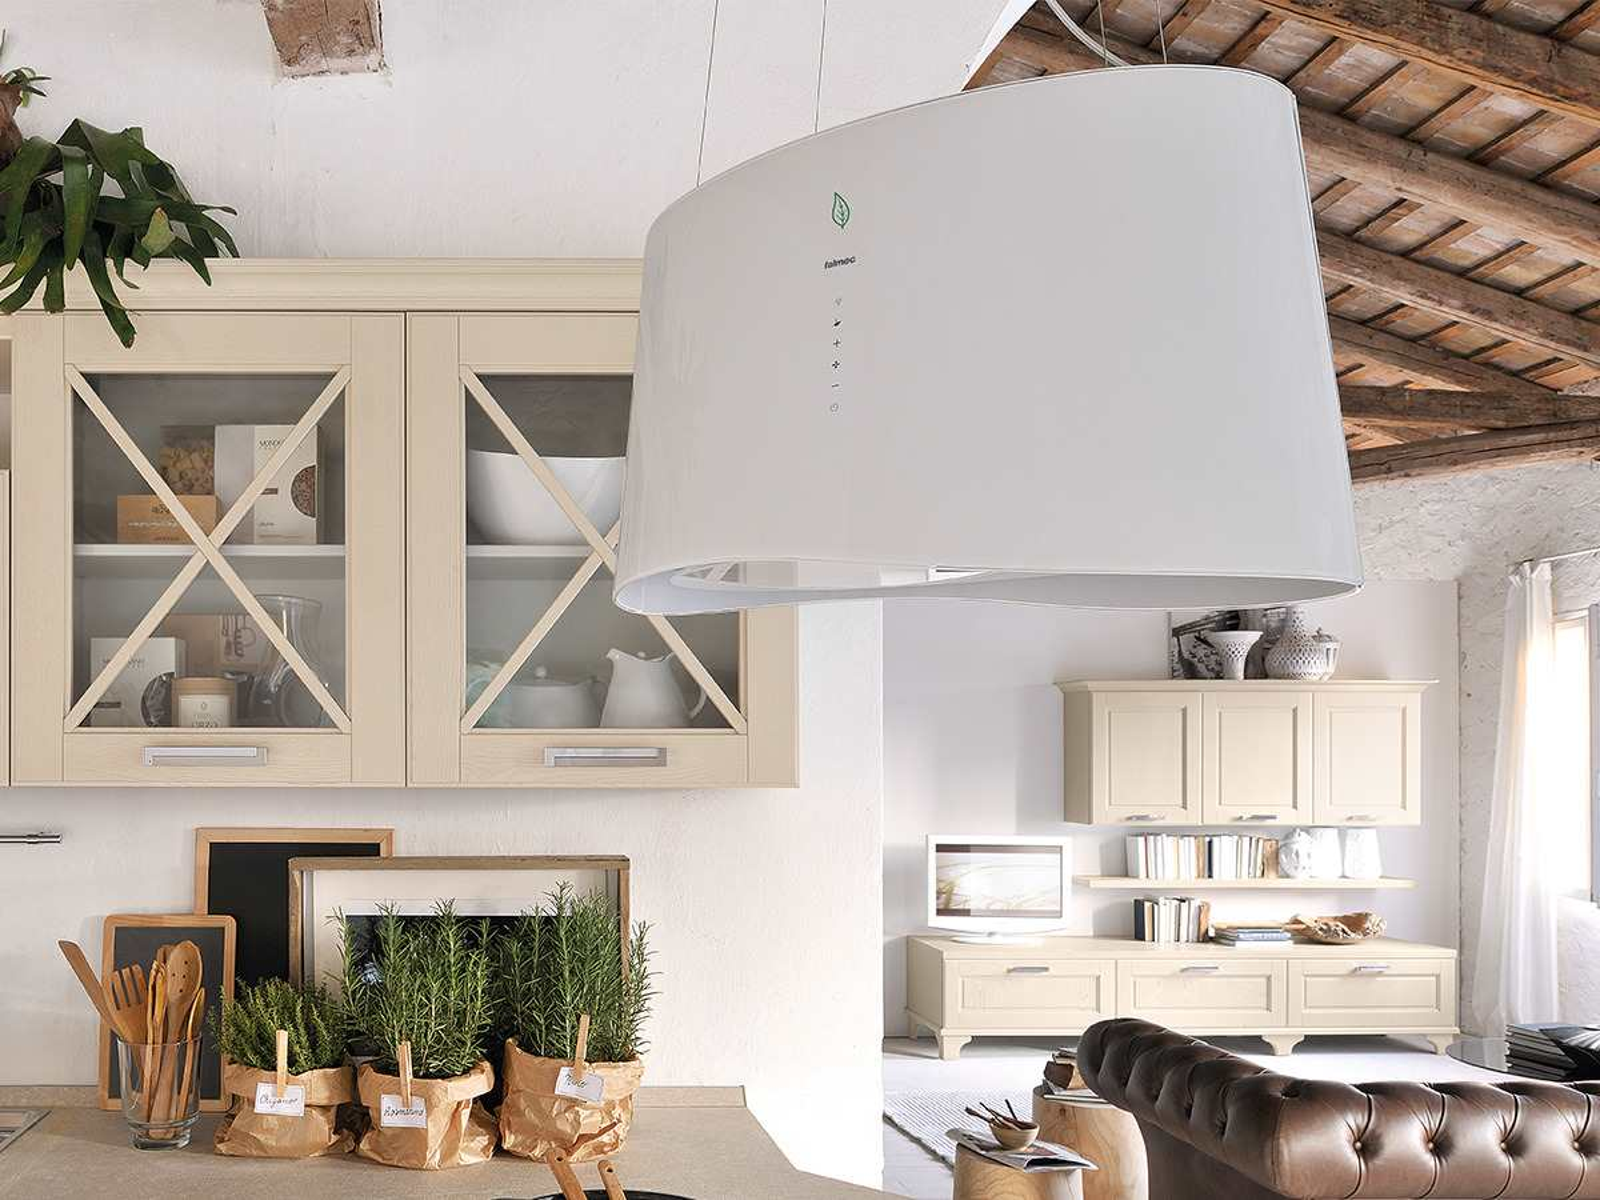 design dunstabzugshaube insel 54 images chestha. Black Bedroom Furniture Sets. Home Design Ideas